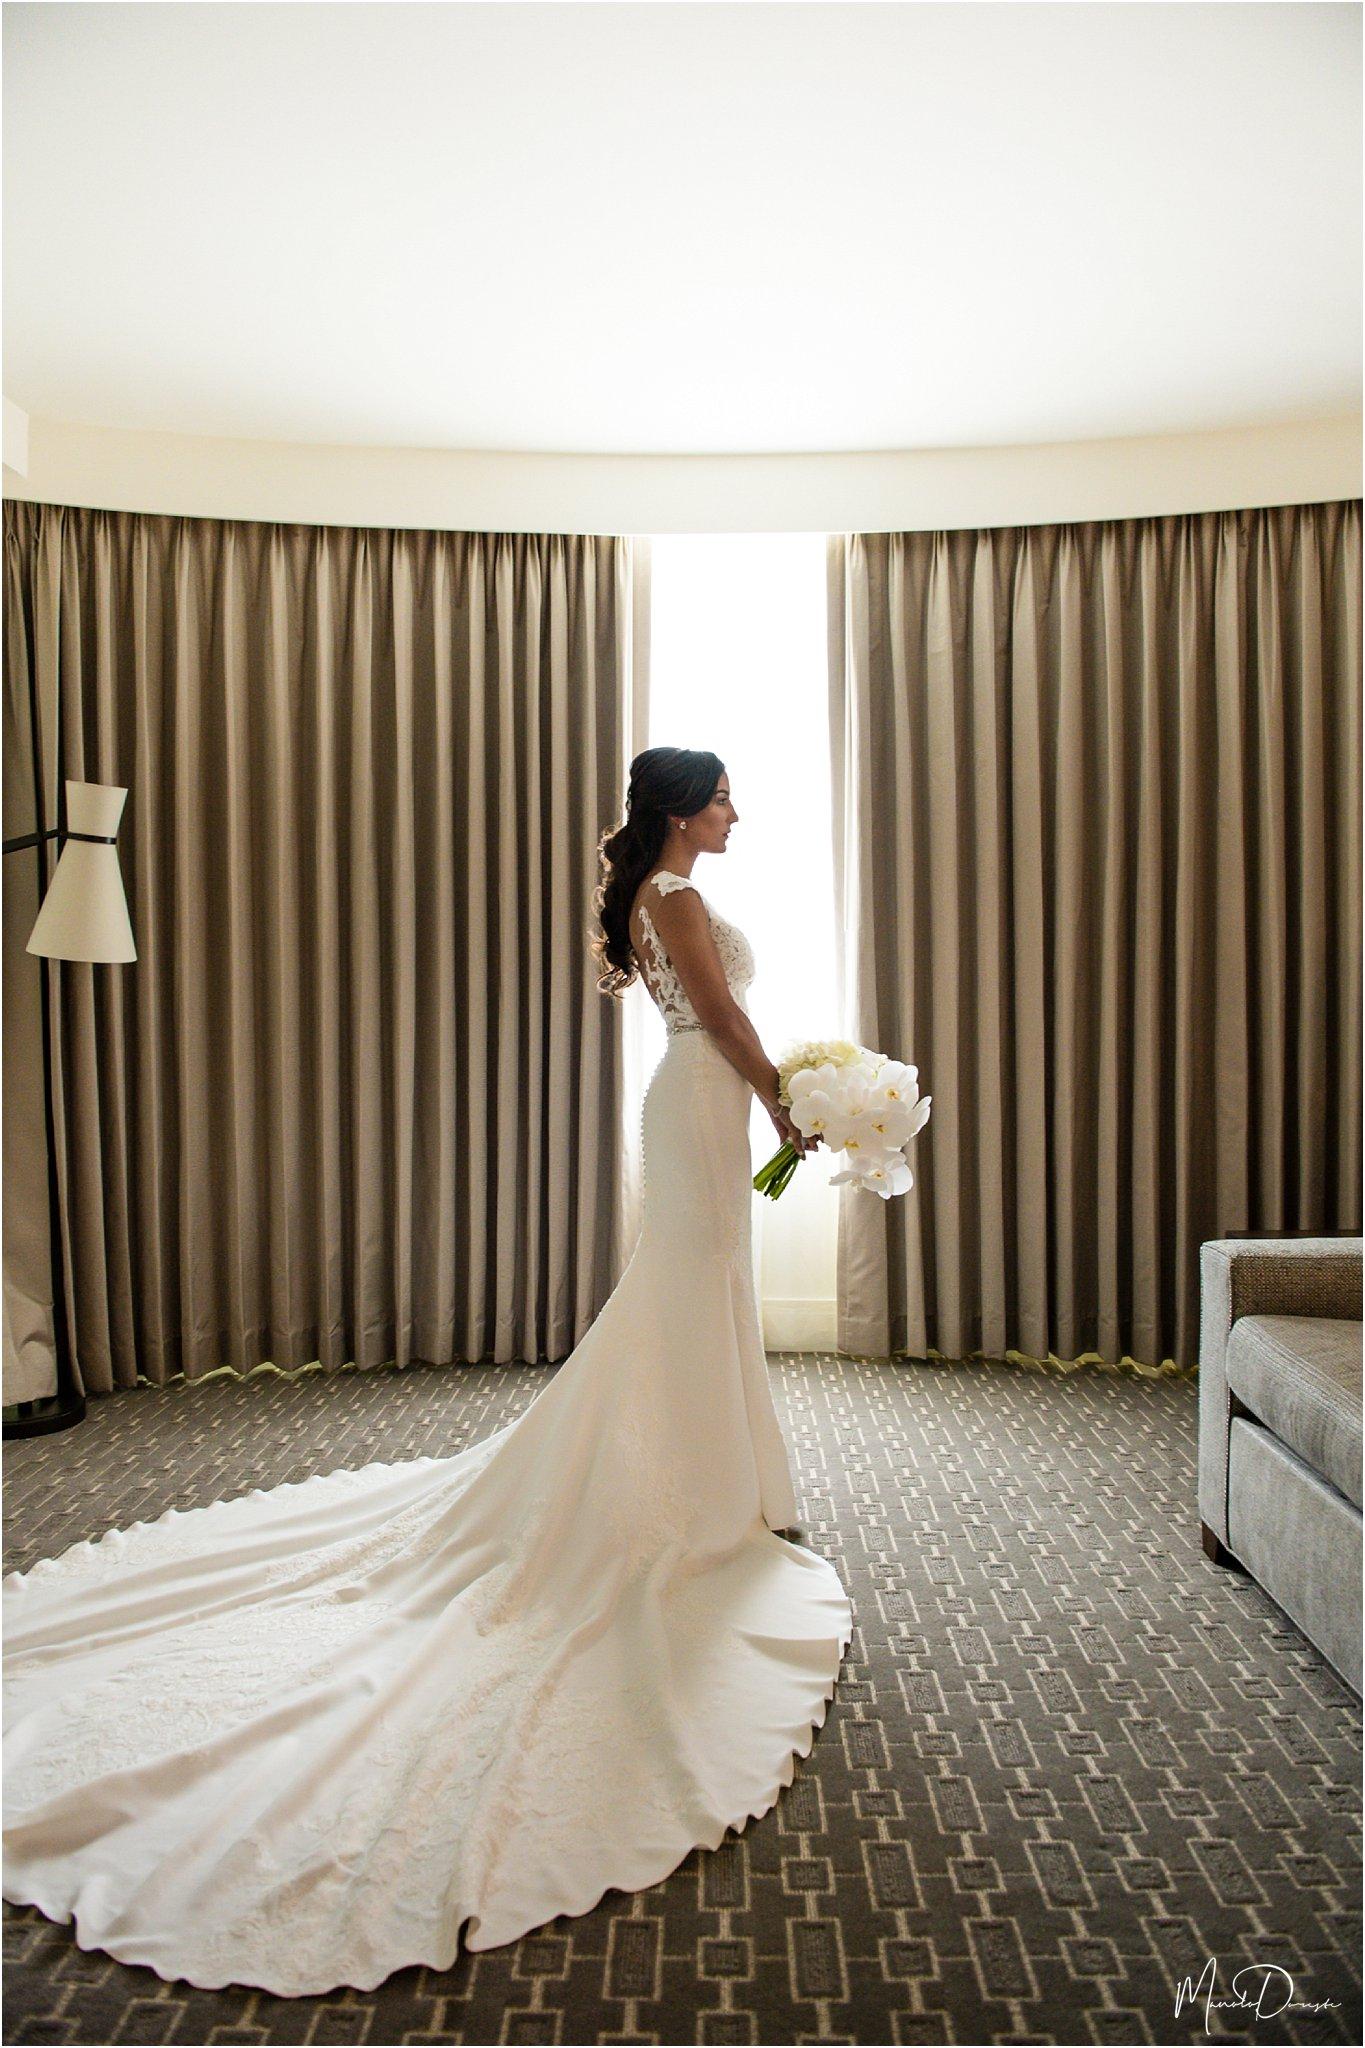 0312_ManoloDoreste_InFocusStudios_Wedding_Family_Photography_Miami_MiamiPhotographer.jpg